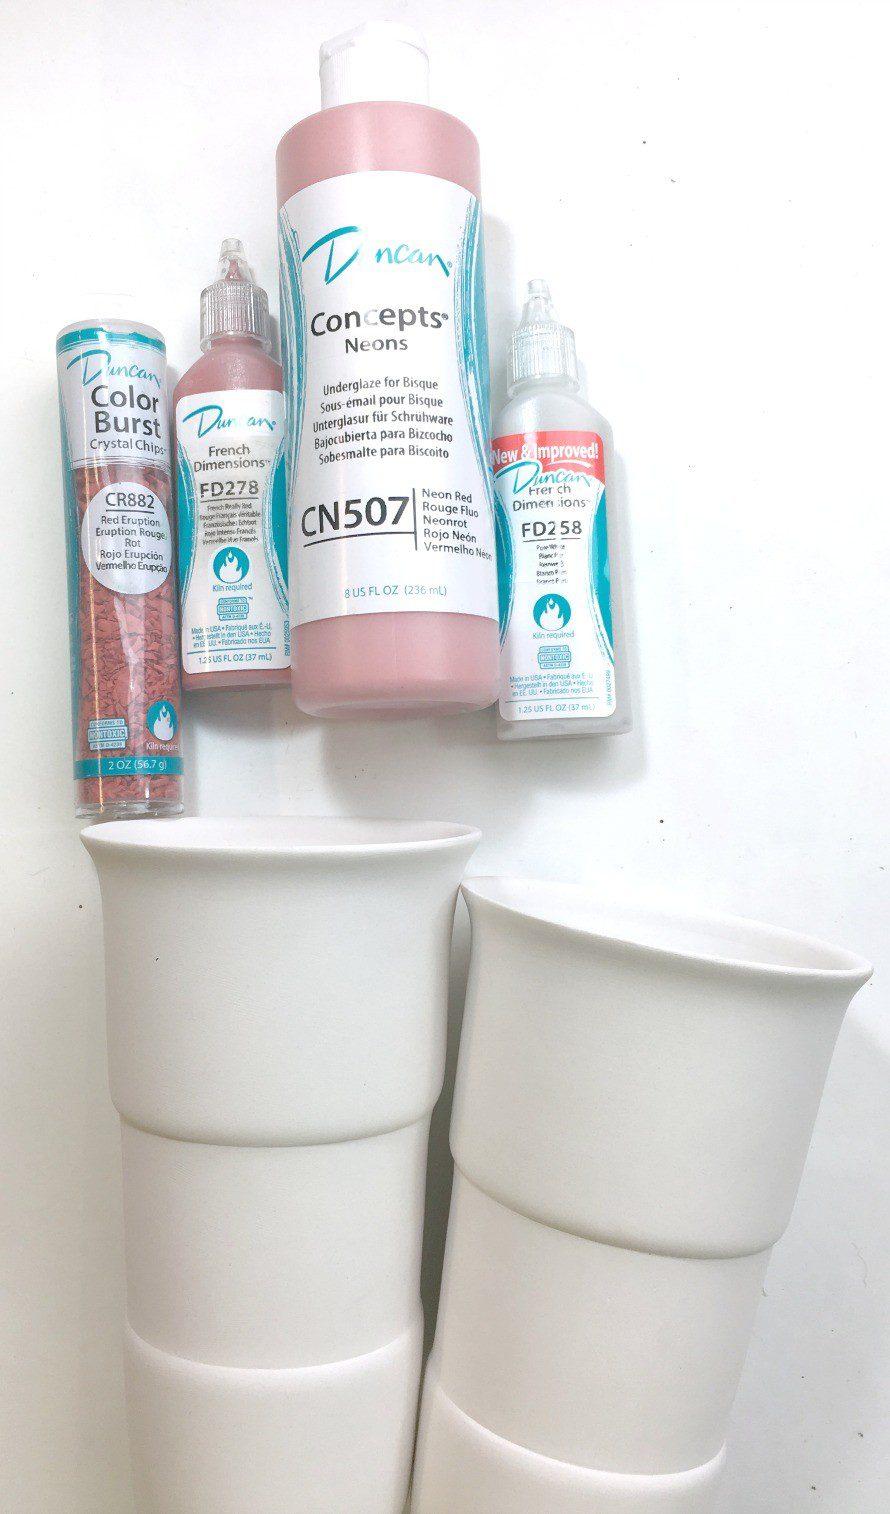 diy-red-cup